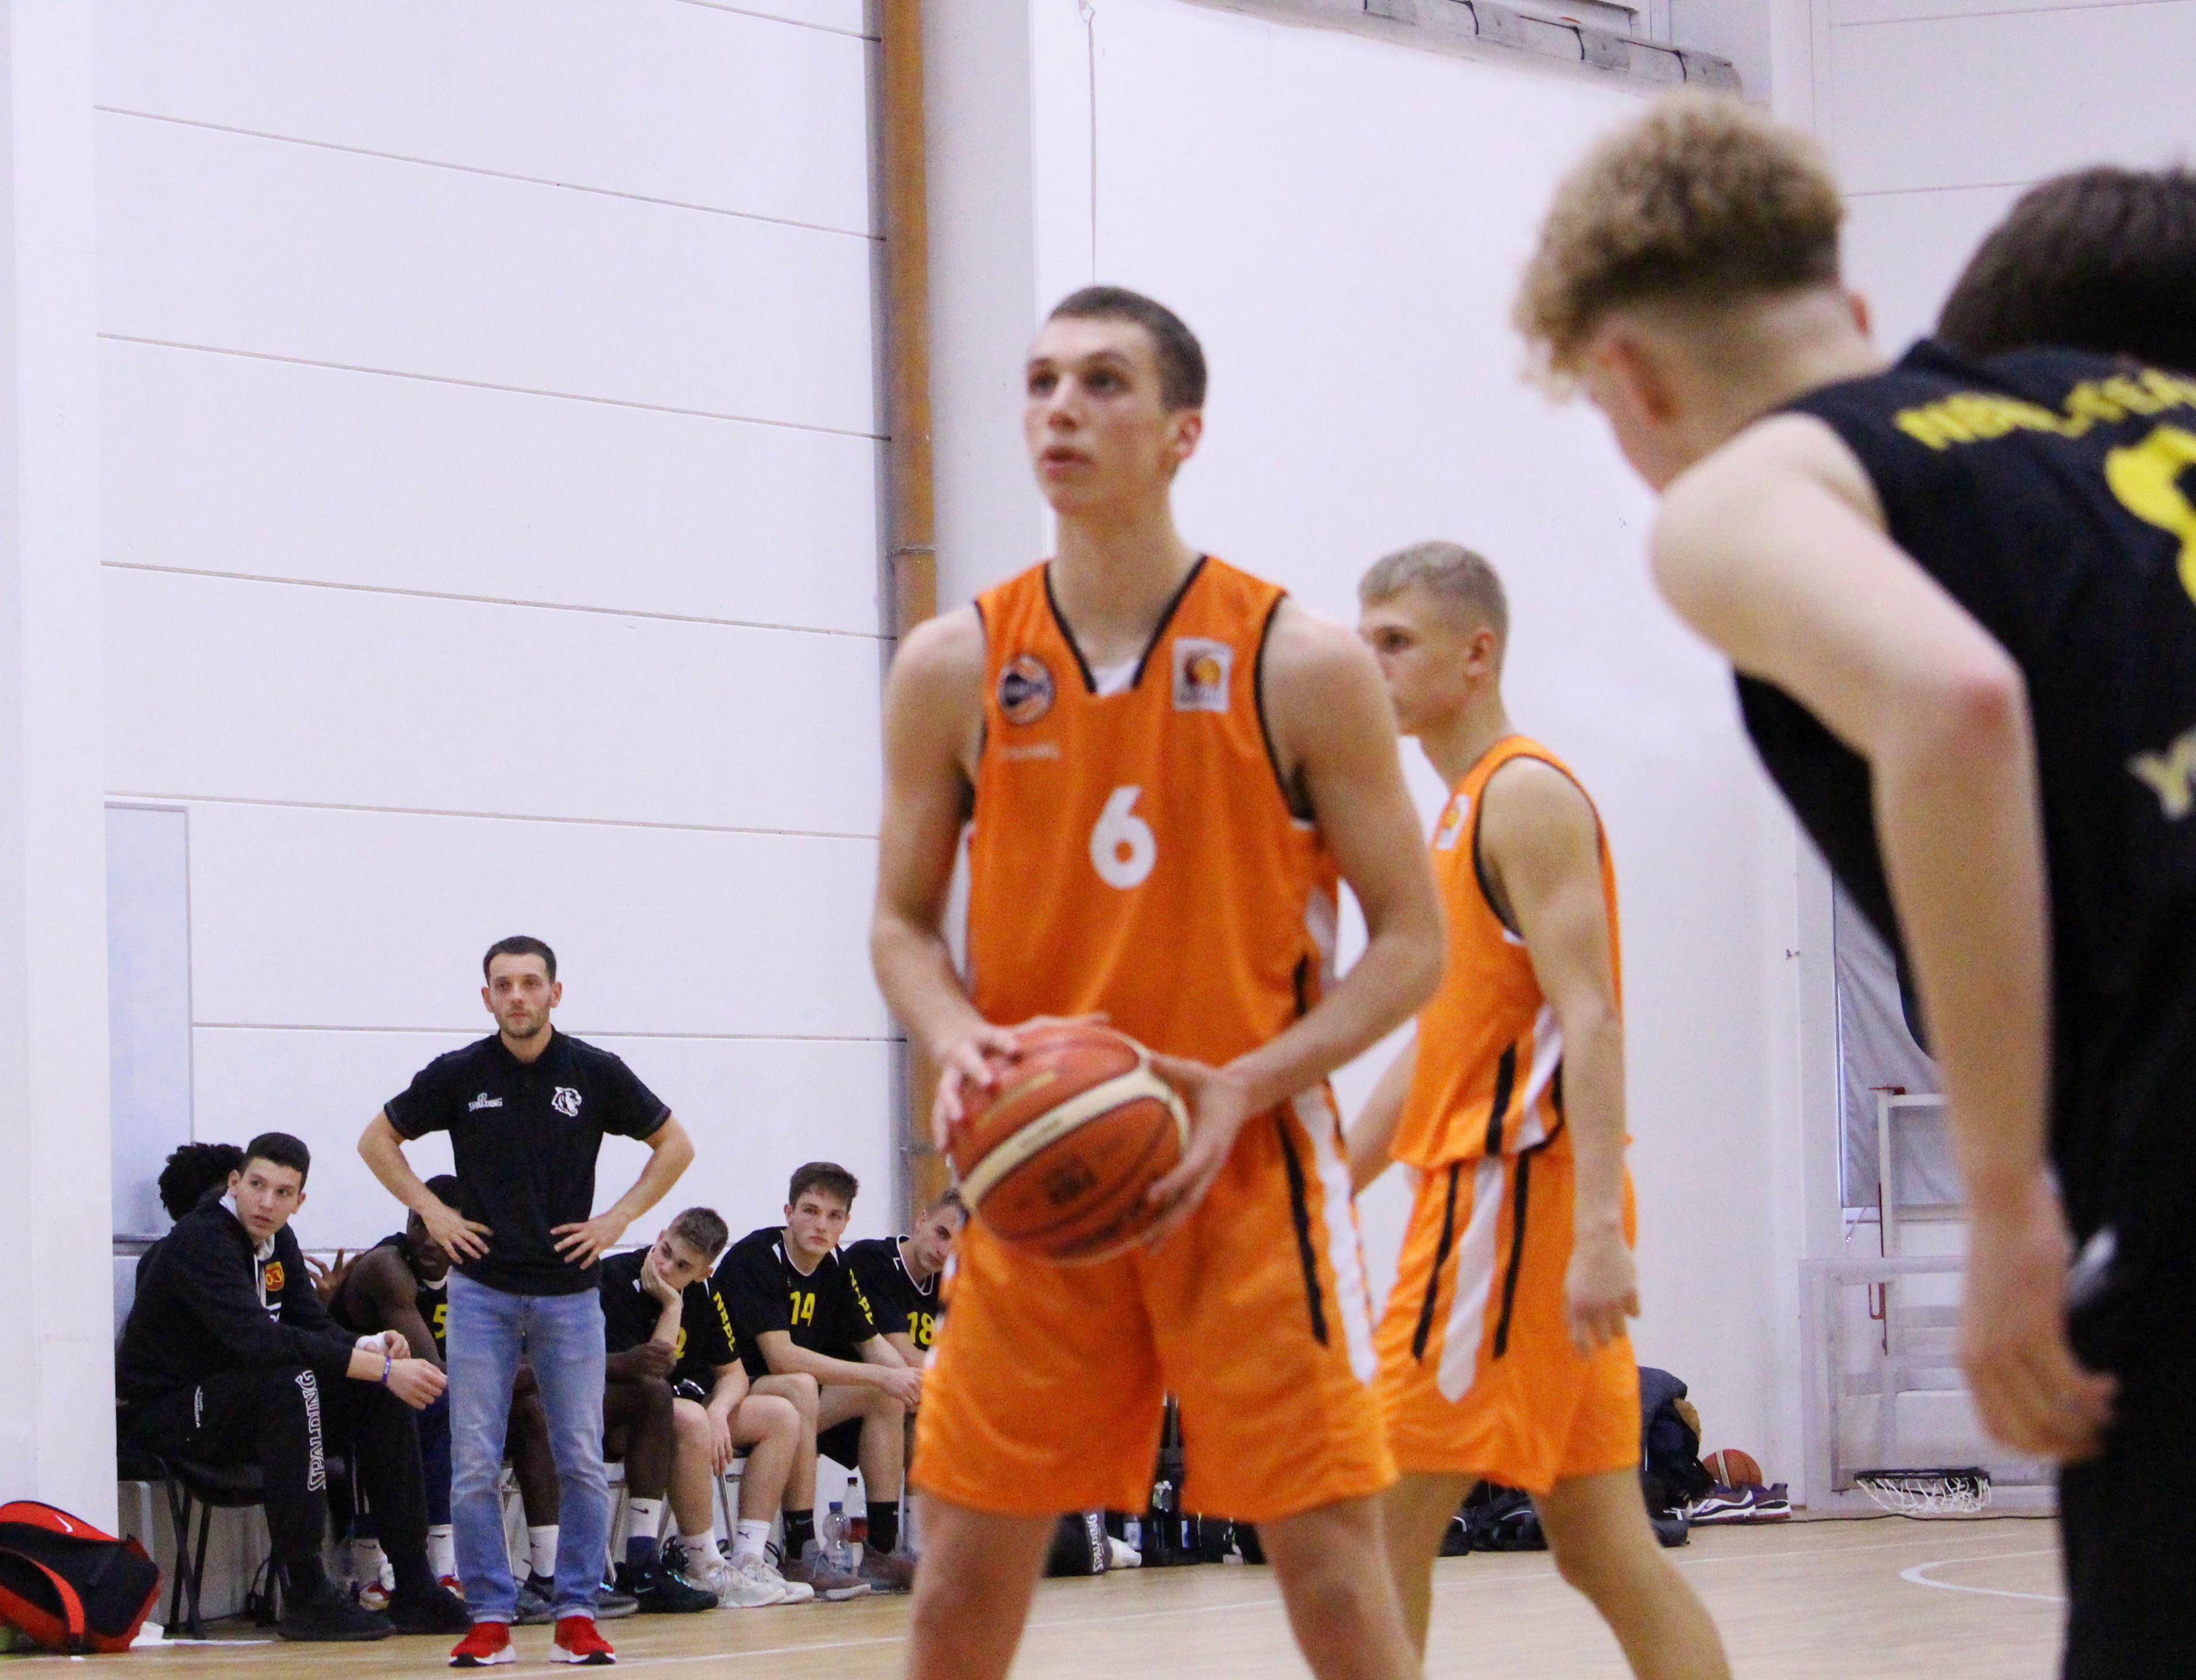 NBBL_19-20_OrangeAcademy_Young-Tigers-Tübingen_Spieltag3_Aleksa-Bulajic-3